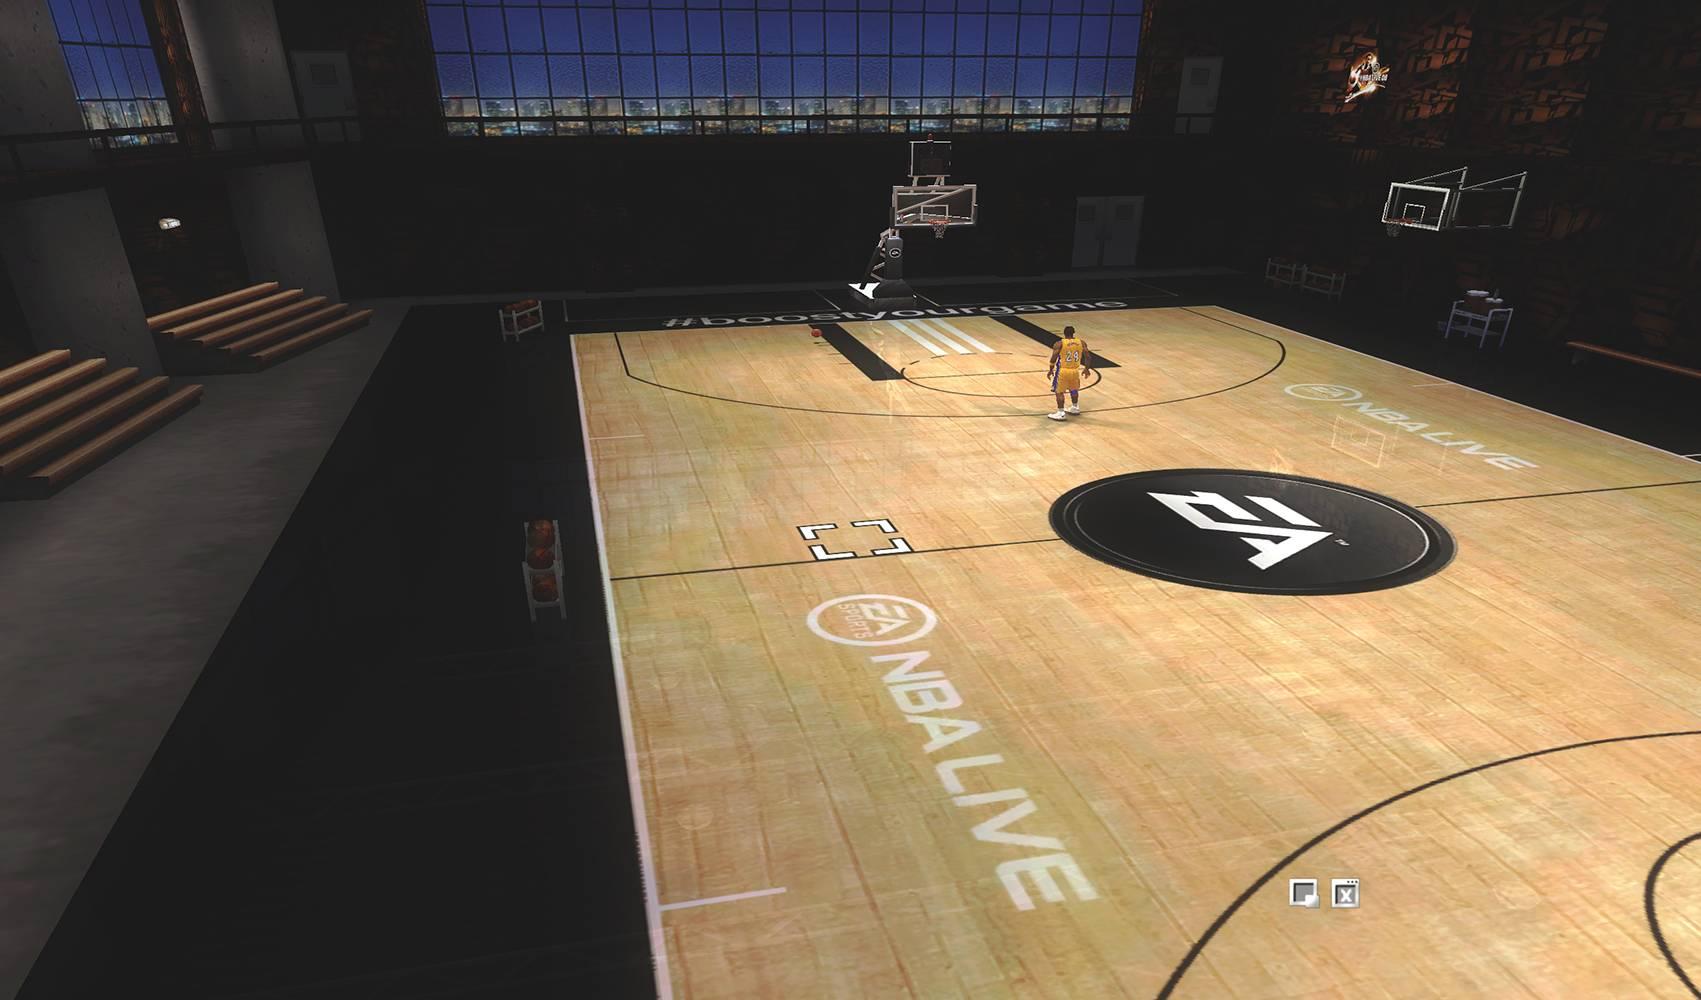 NBA LIVE 08【2K】-2021-03-31-01-58-25-341副本.jpg